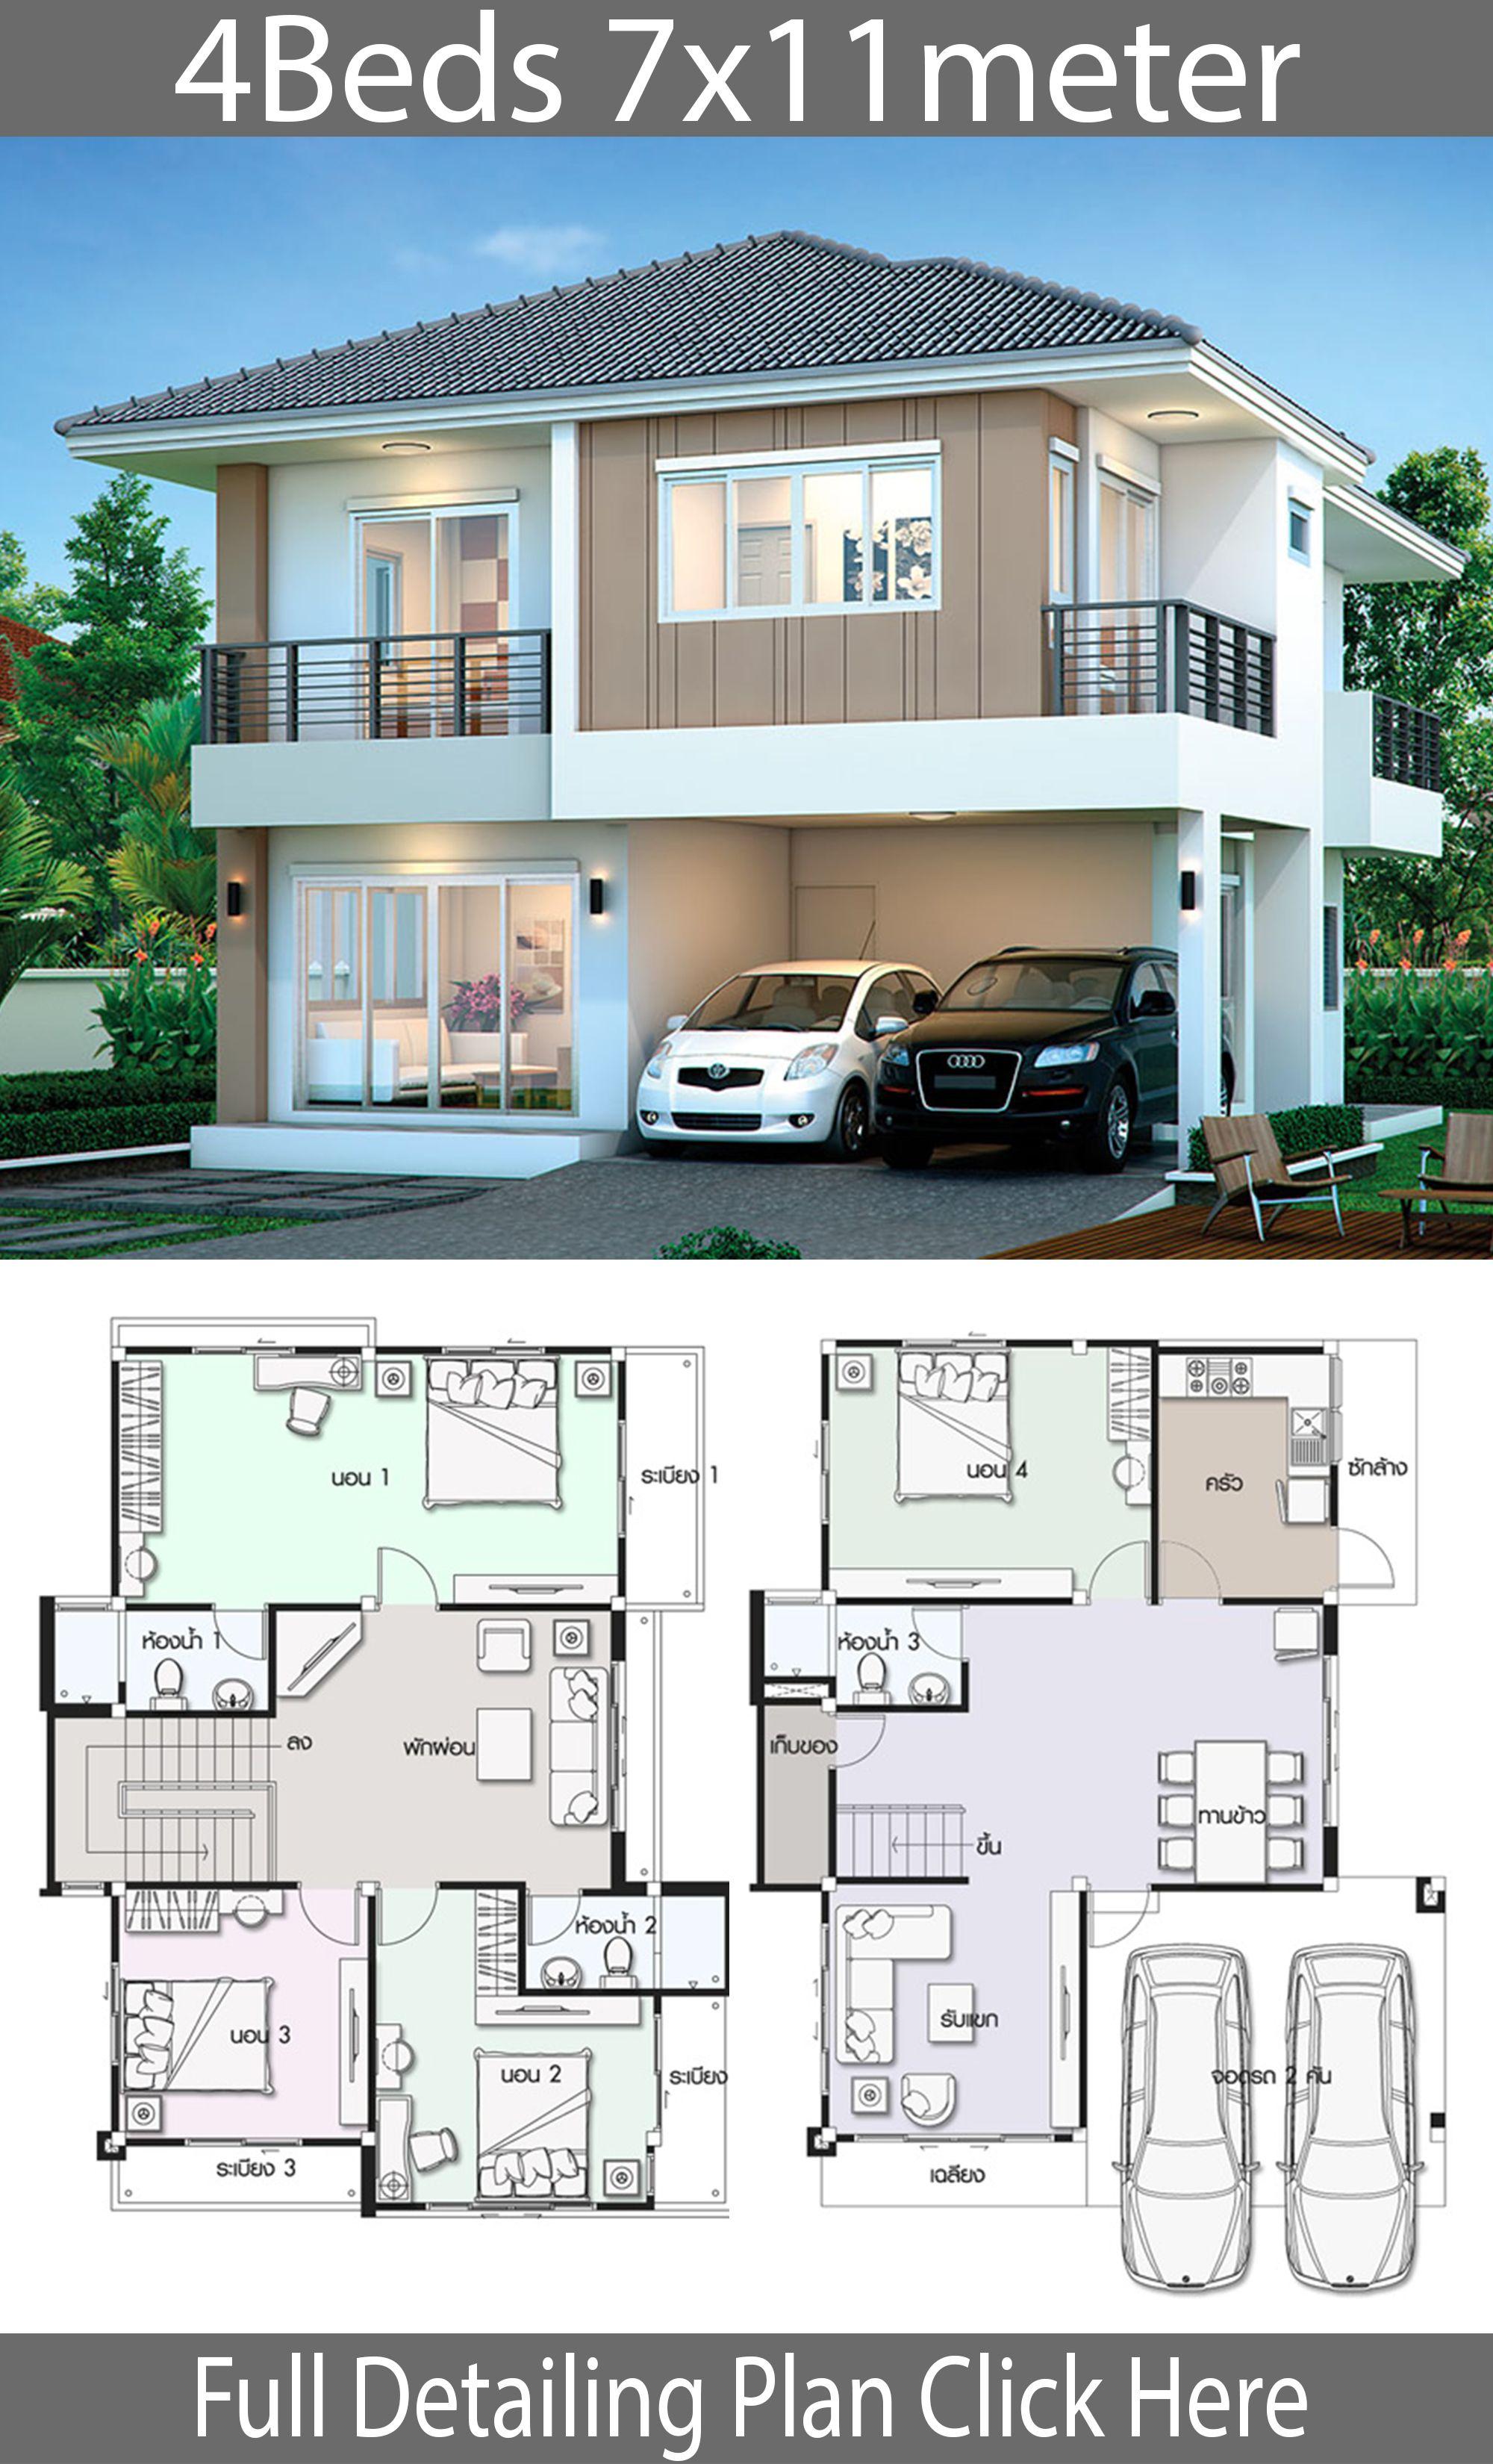 House Design Plan 7x11m With 4 Bedrooms House Idea Arsitektur Rumah Denah Rumah Arsitektur Perumahan